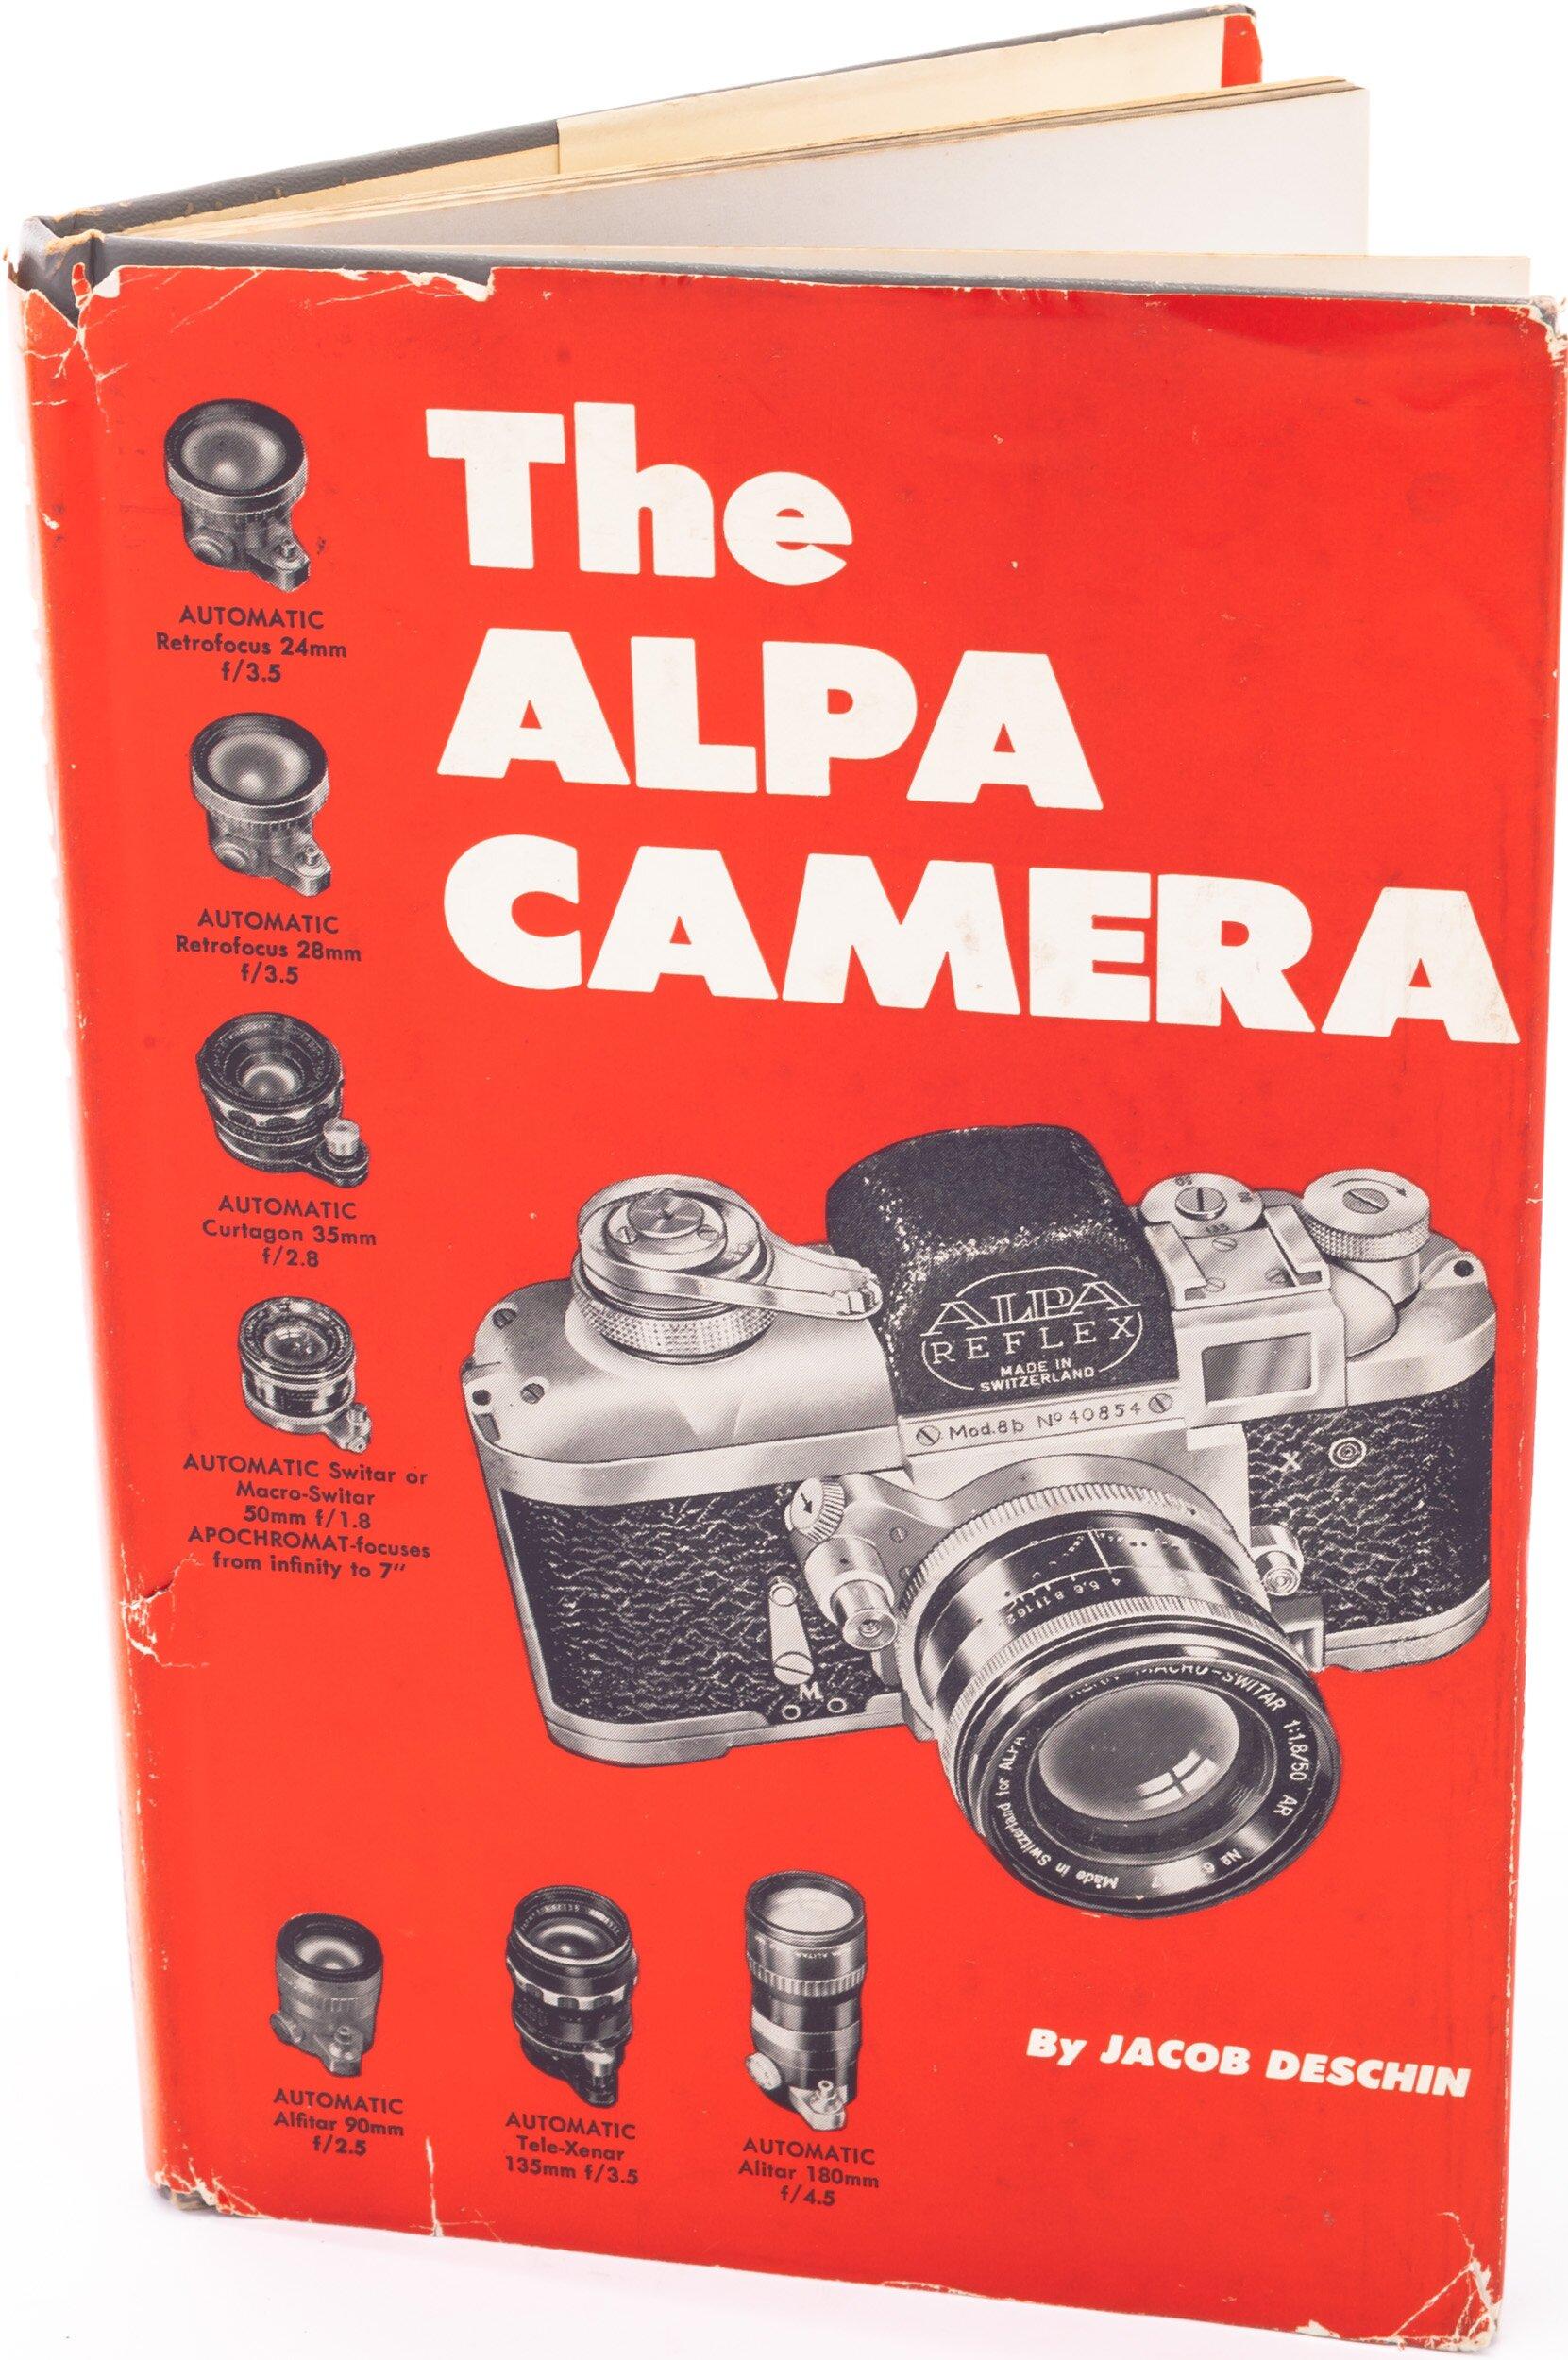 The Alpa Camera, by Jacob Deschin, Buch